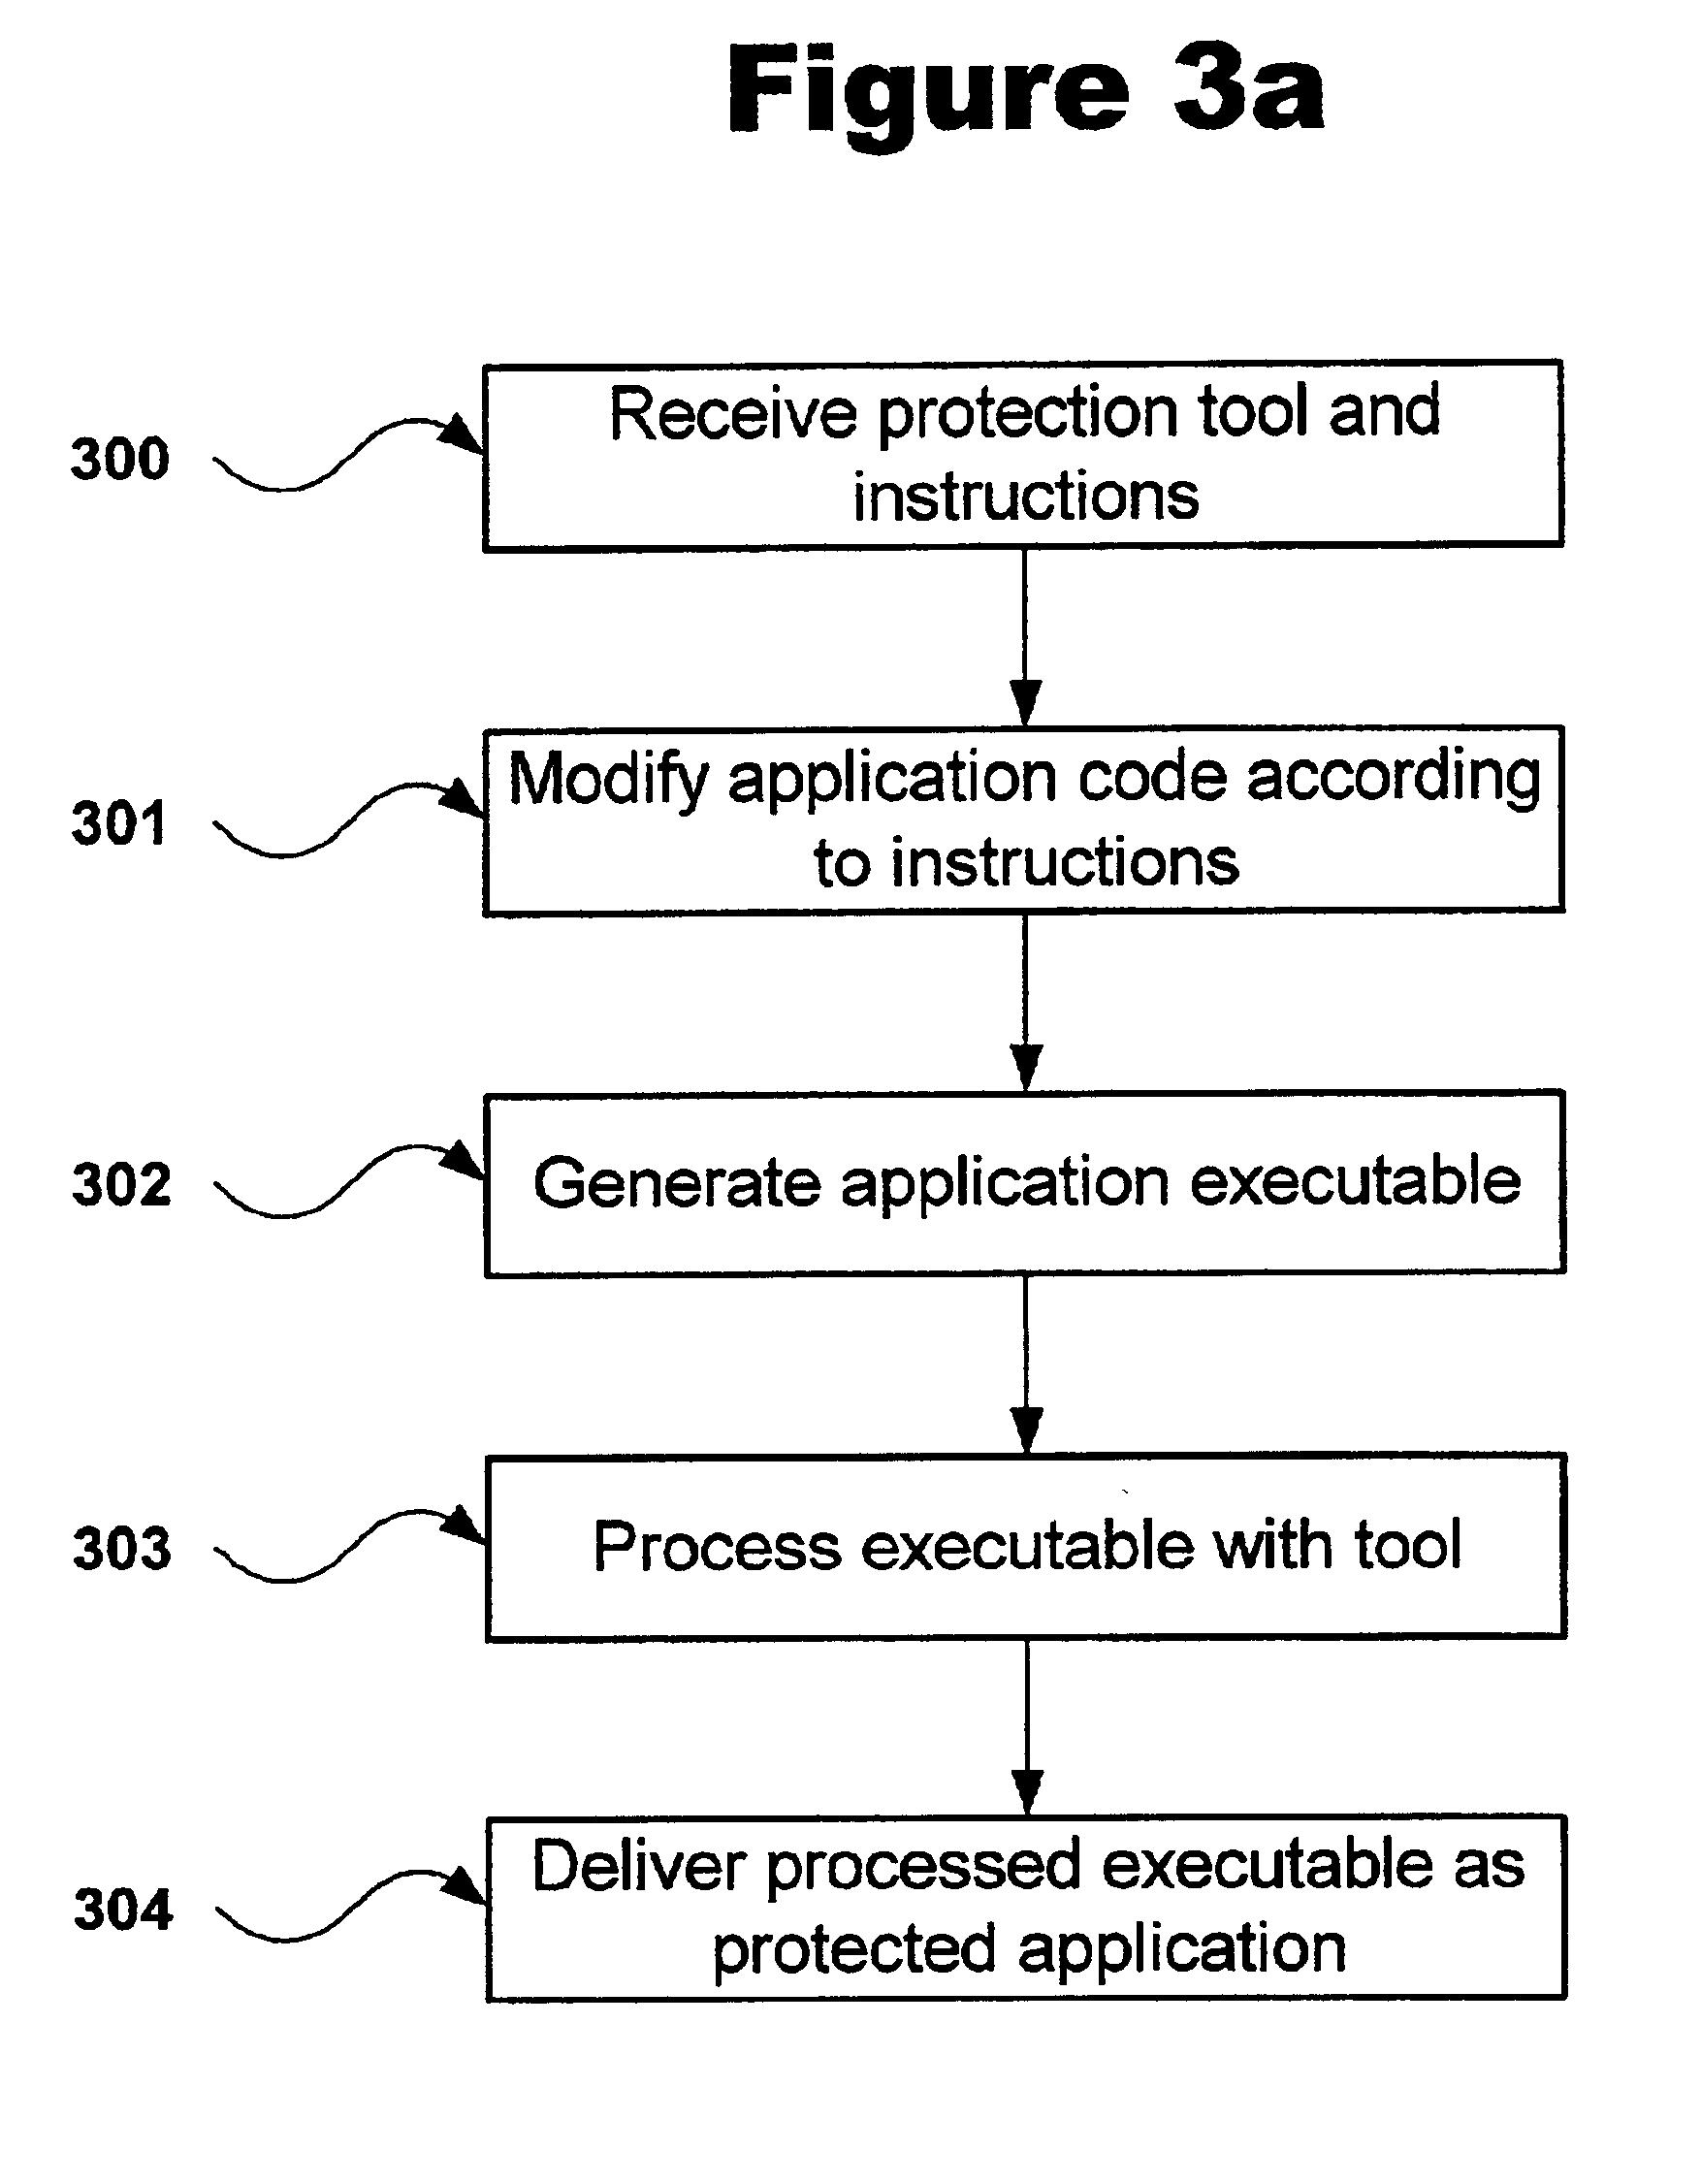 Patent US 6,880,149 B2